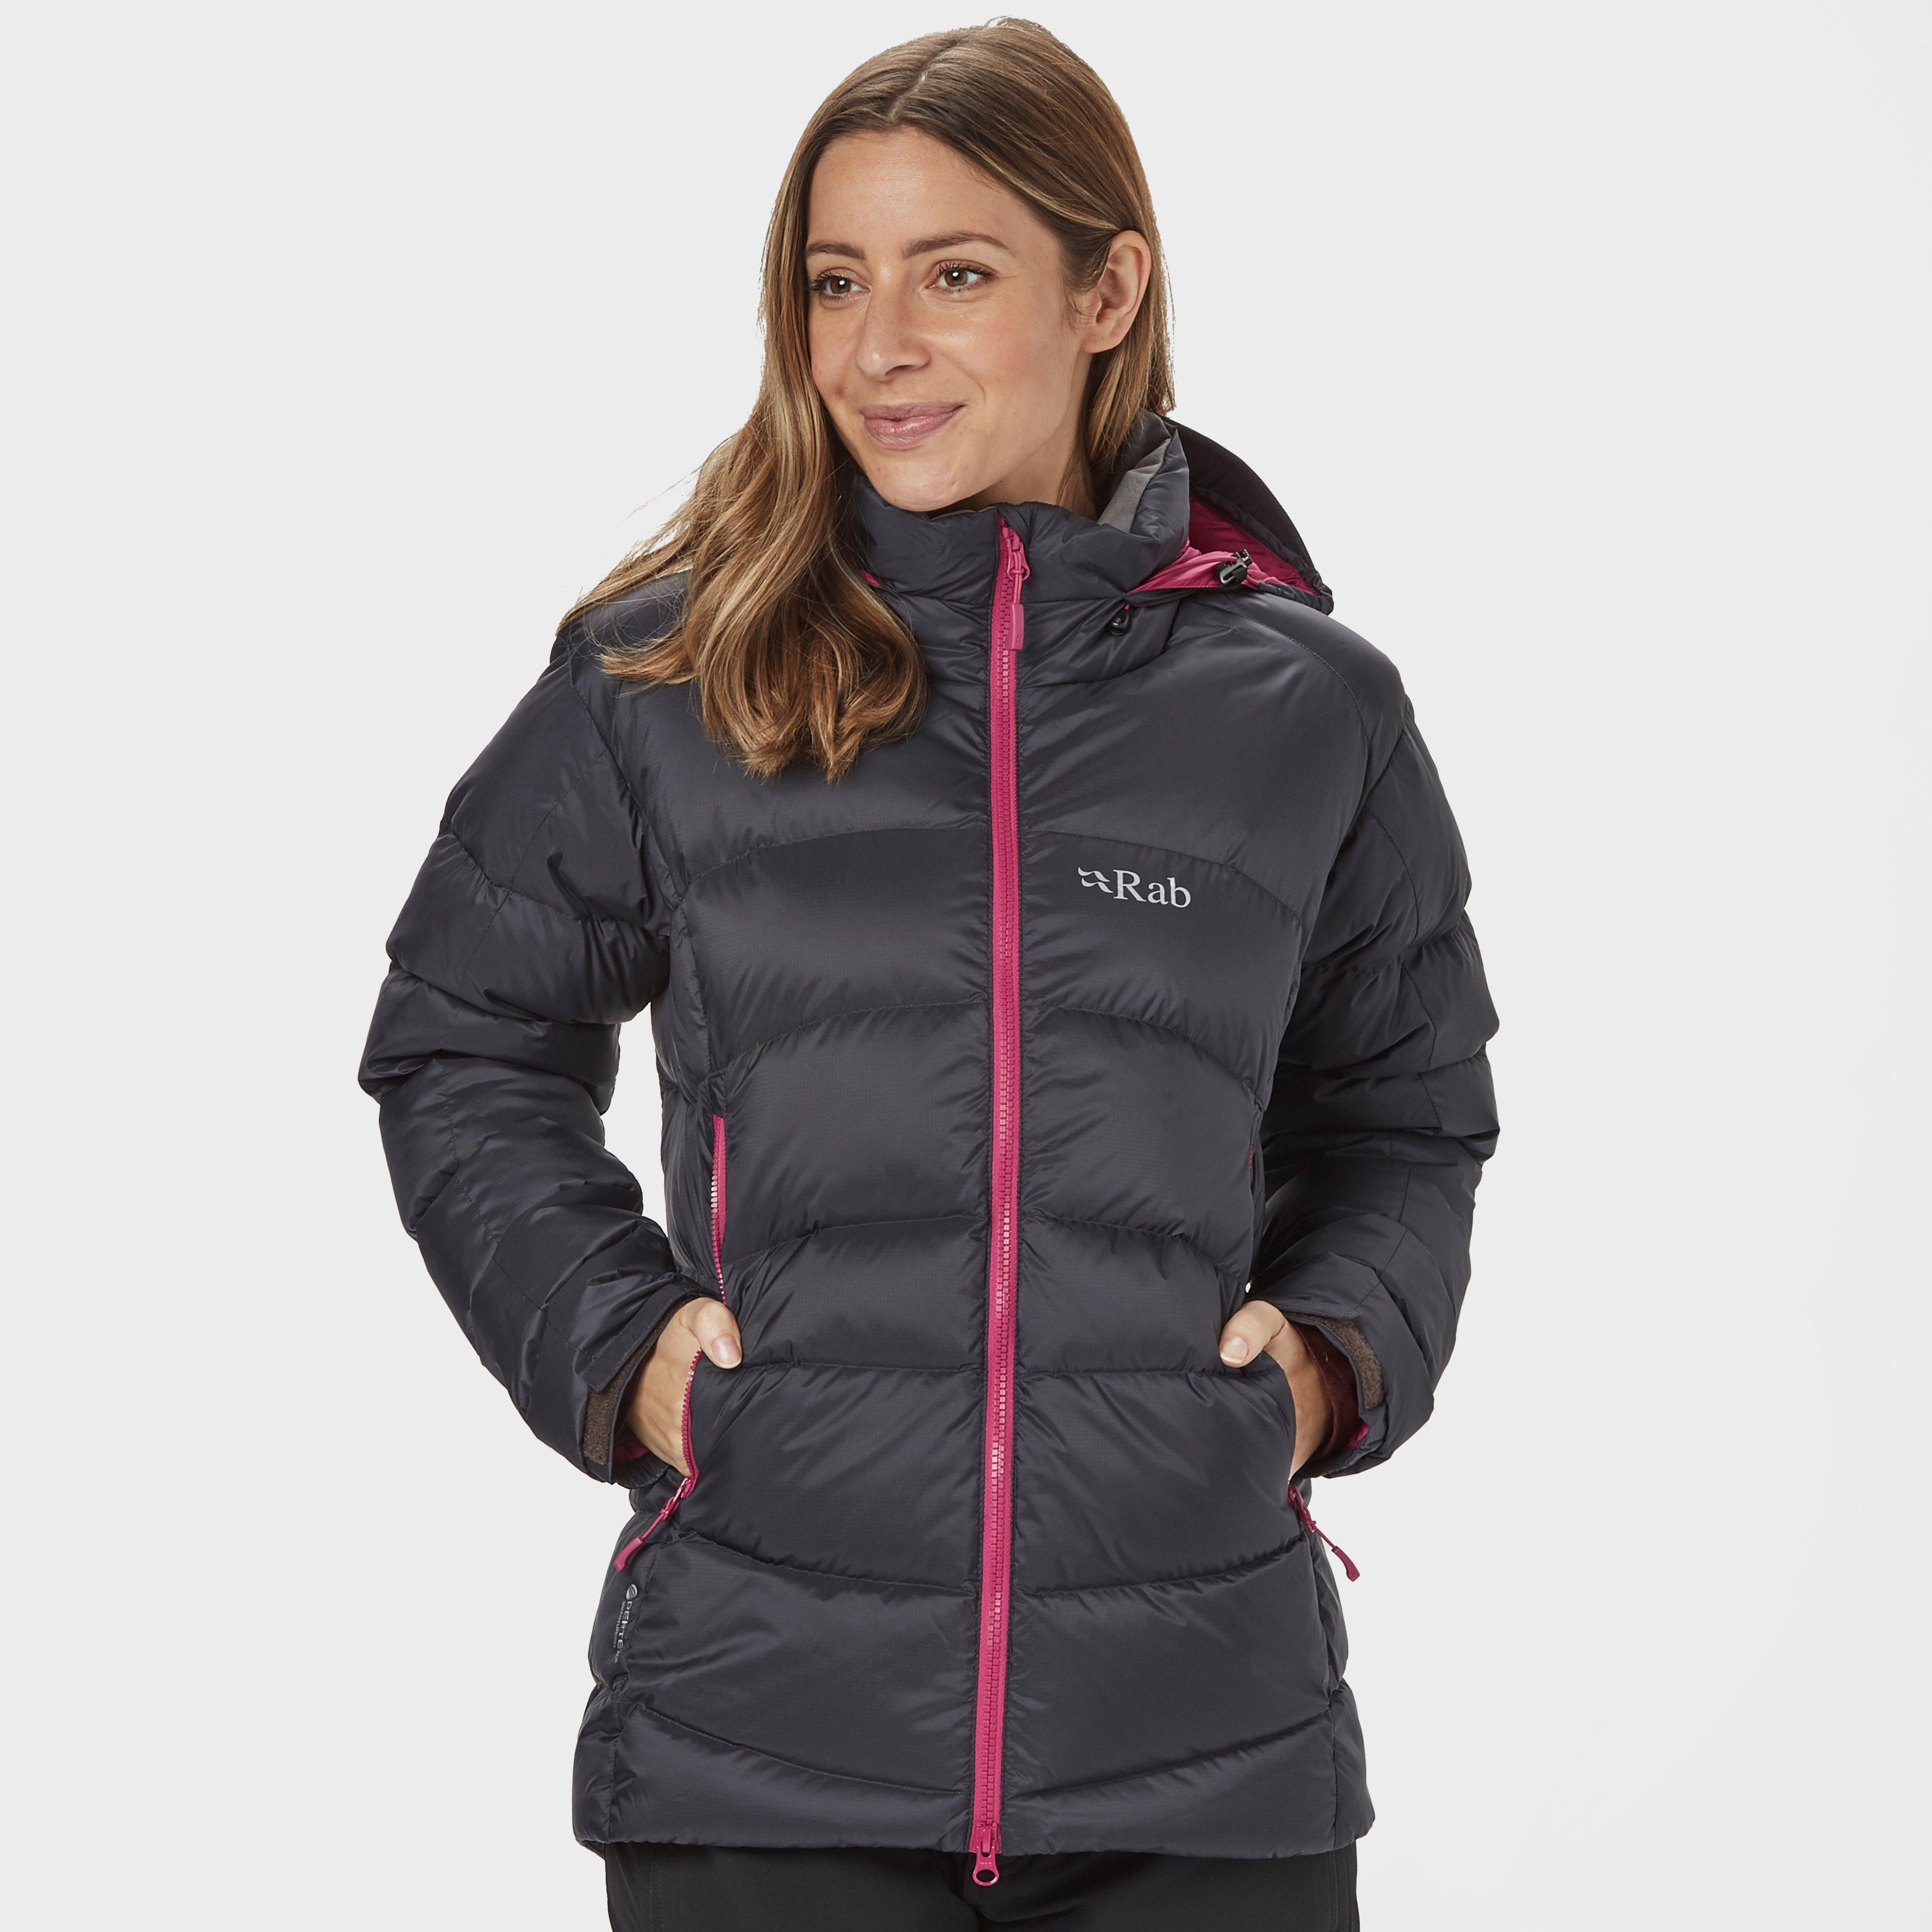 Rab Women's Ascent Down Jacket, BELUGA/DGY